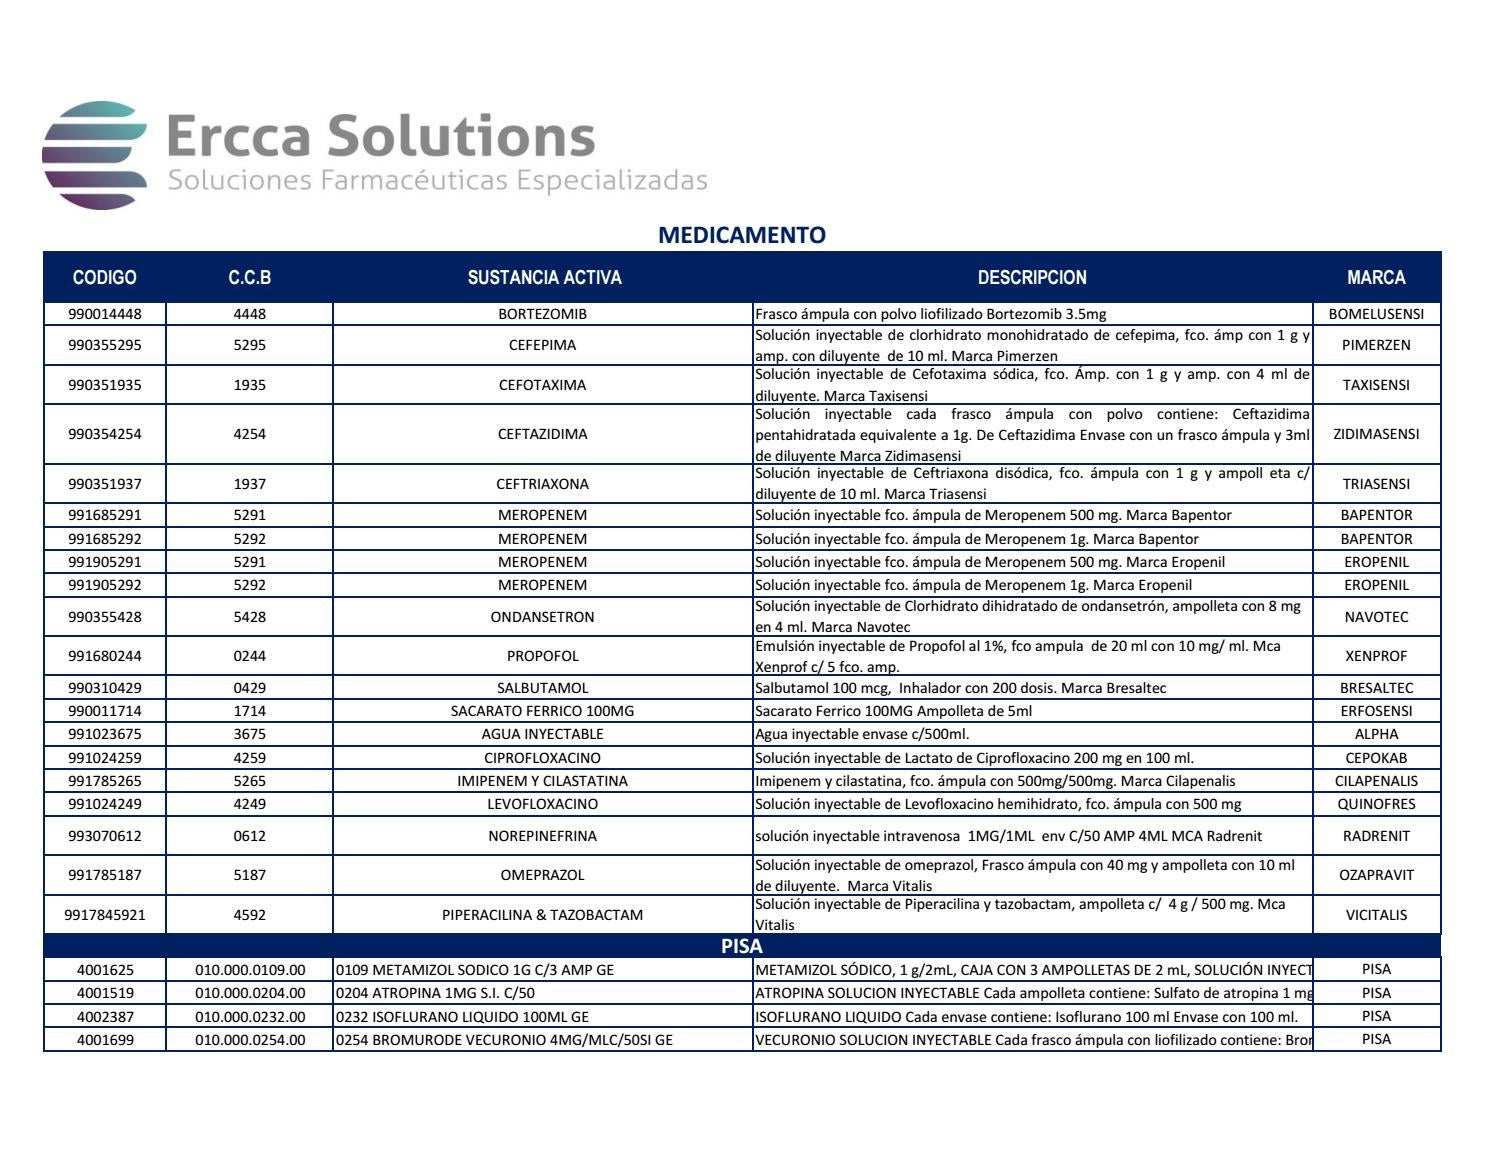 Catalago Medicamentos V1 0 2018 Ercca Solutions By Mercadotecnia